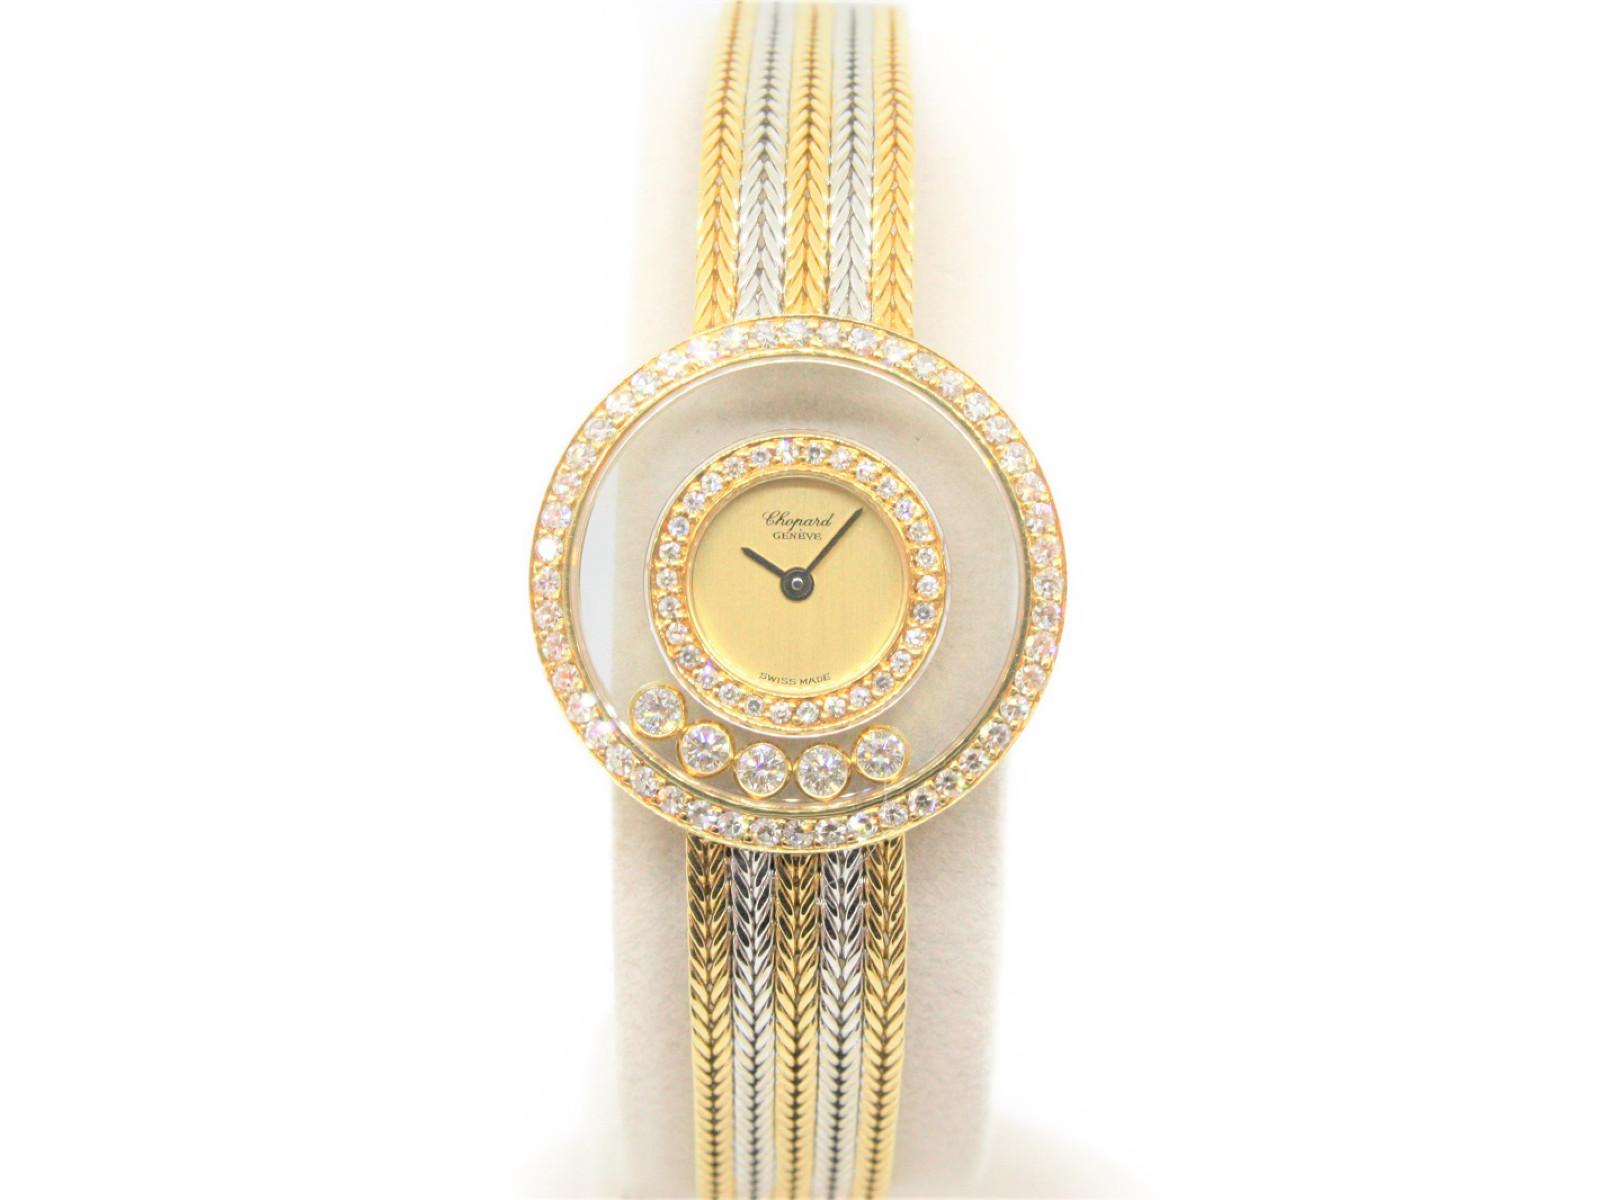 CHOPARD ショパール ハッピーダイヤモンド 4097 K18 金無垢 5Pダイヤ 丸型ケース ブレスレット 宝石 レディース クオーツ 腕時計 【中古】